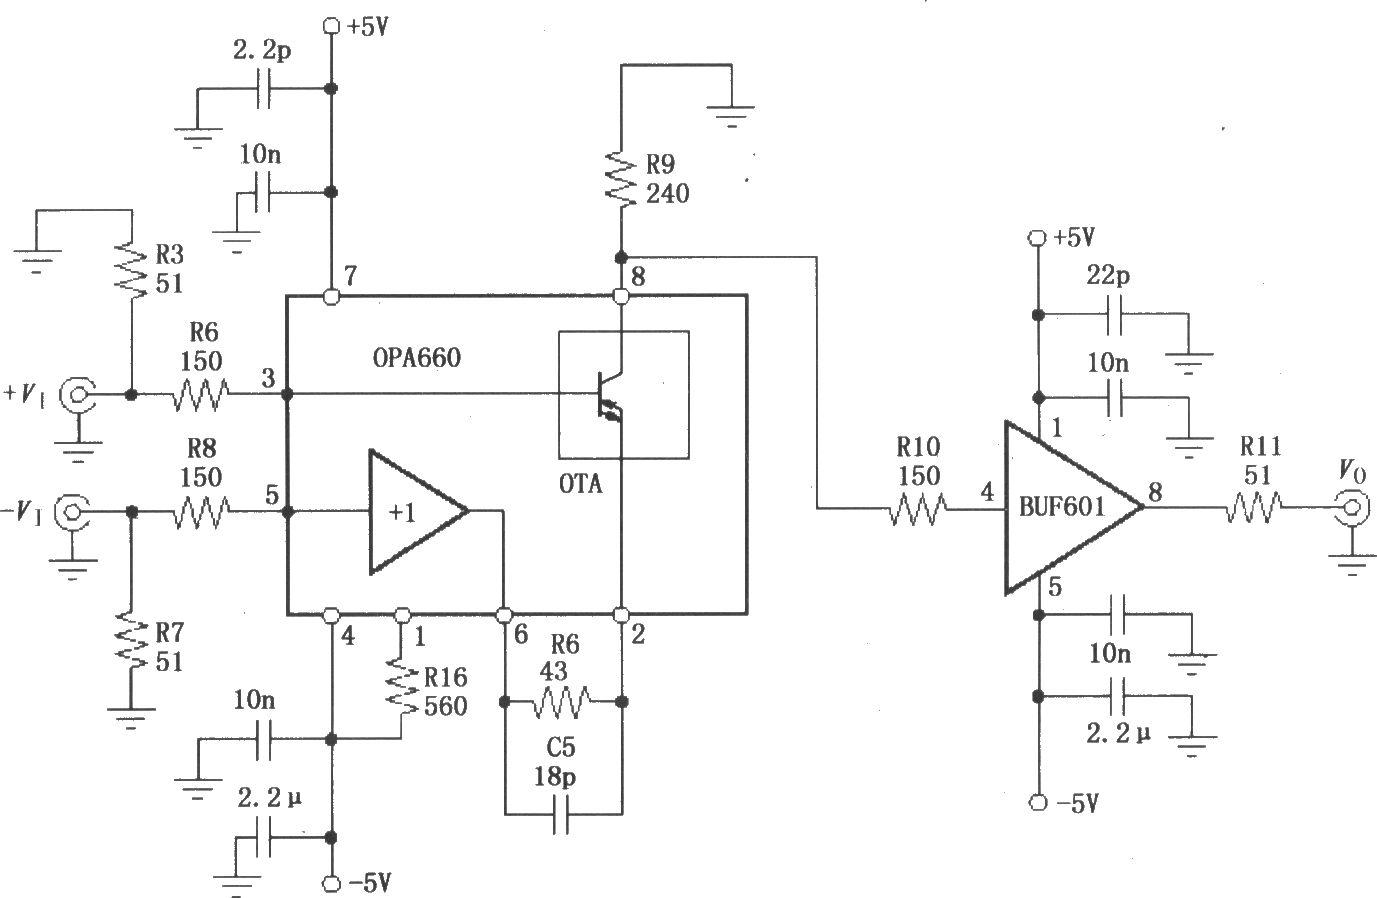 BUF601构成的400MHz差分放大电路。差分信号电压VI、-VI分别经过150电阻和51匹配电阻加到OPA660内部OTA的3脚和 1放大器输入端5脚,由 1放大器6脚输出到OTA的2脚,差分放大后由OPA660输出端8脚送到缓冲放大器BUF600,经过缓冲放大器BUF601缓冲后输出。